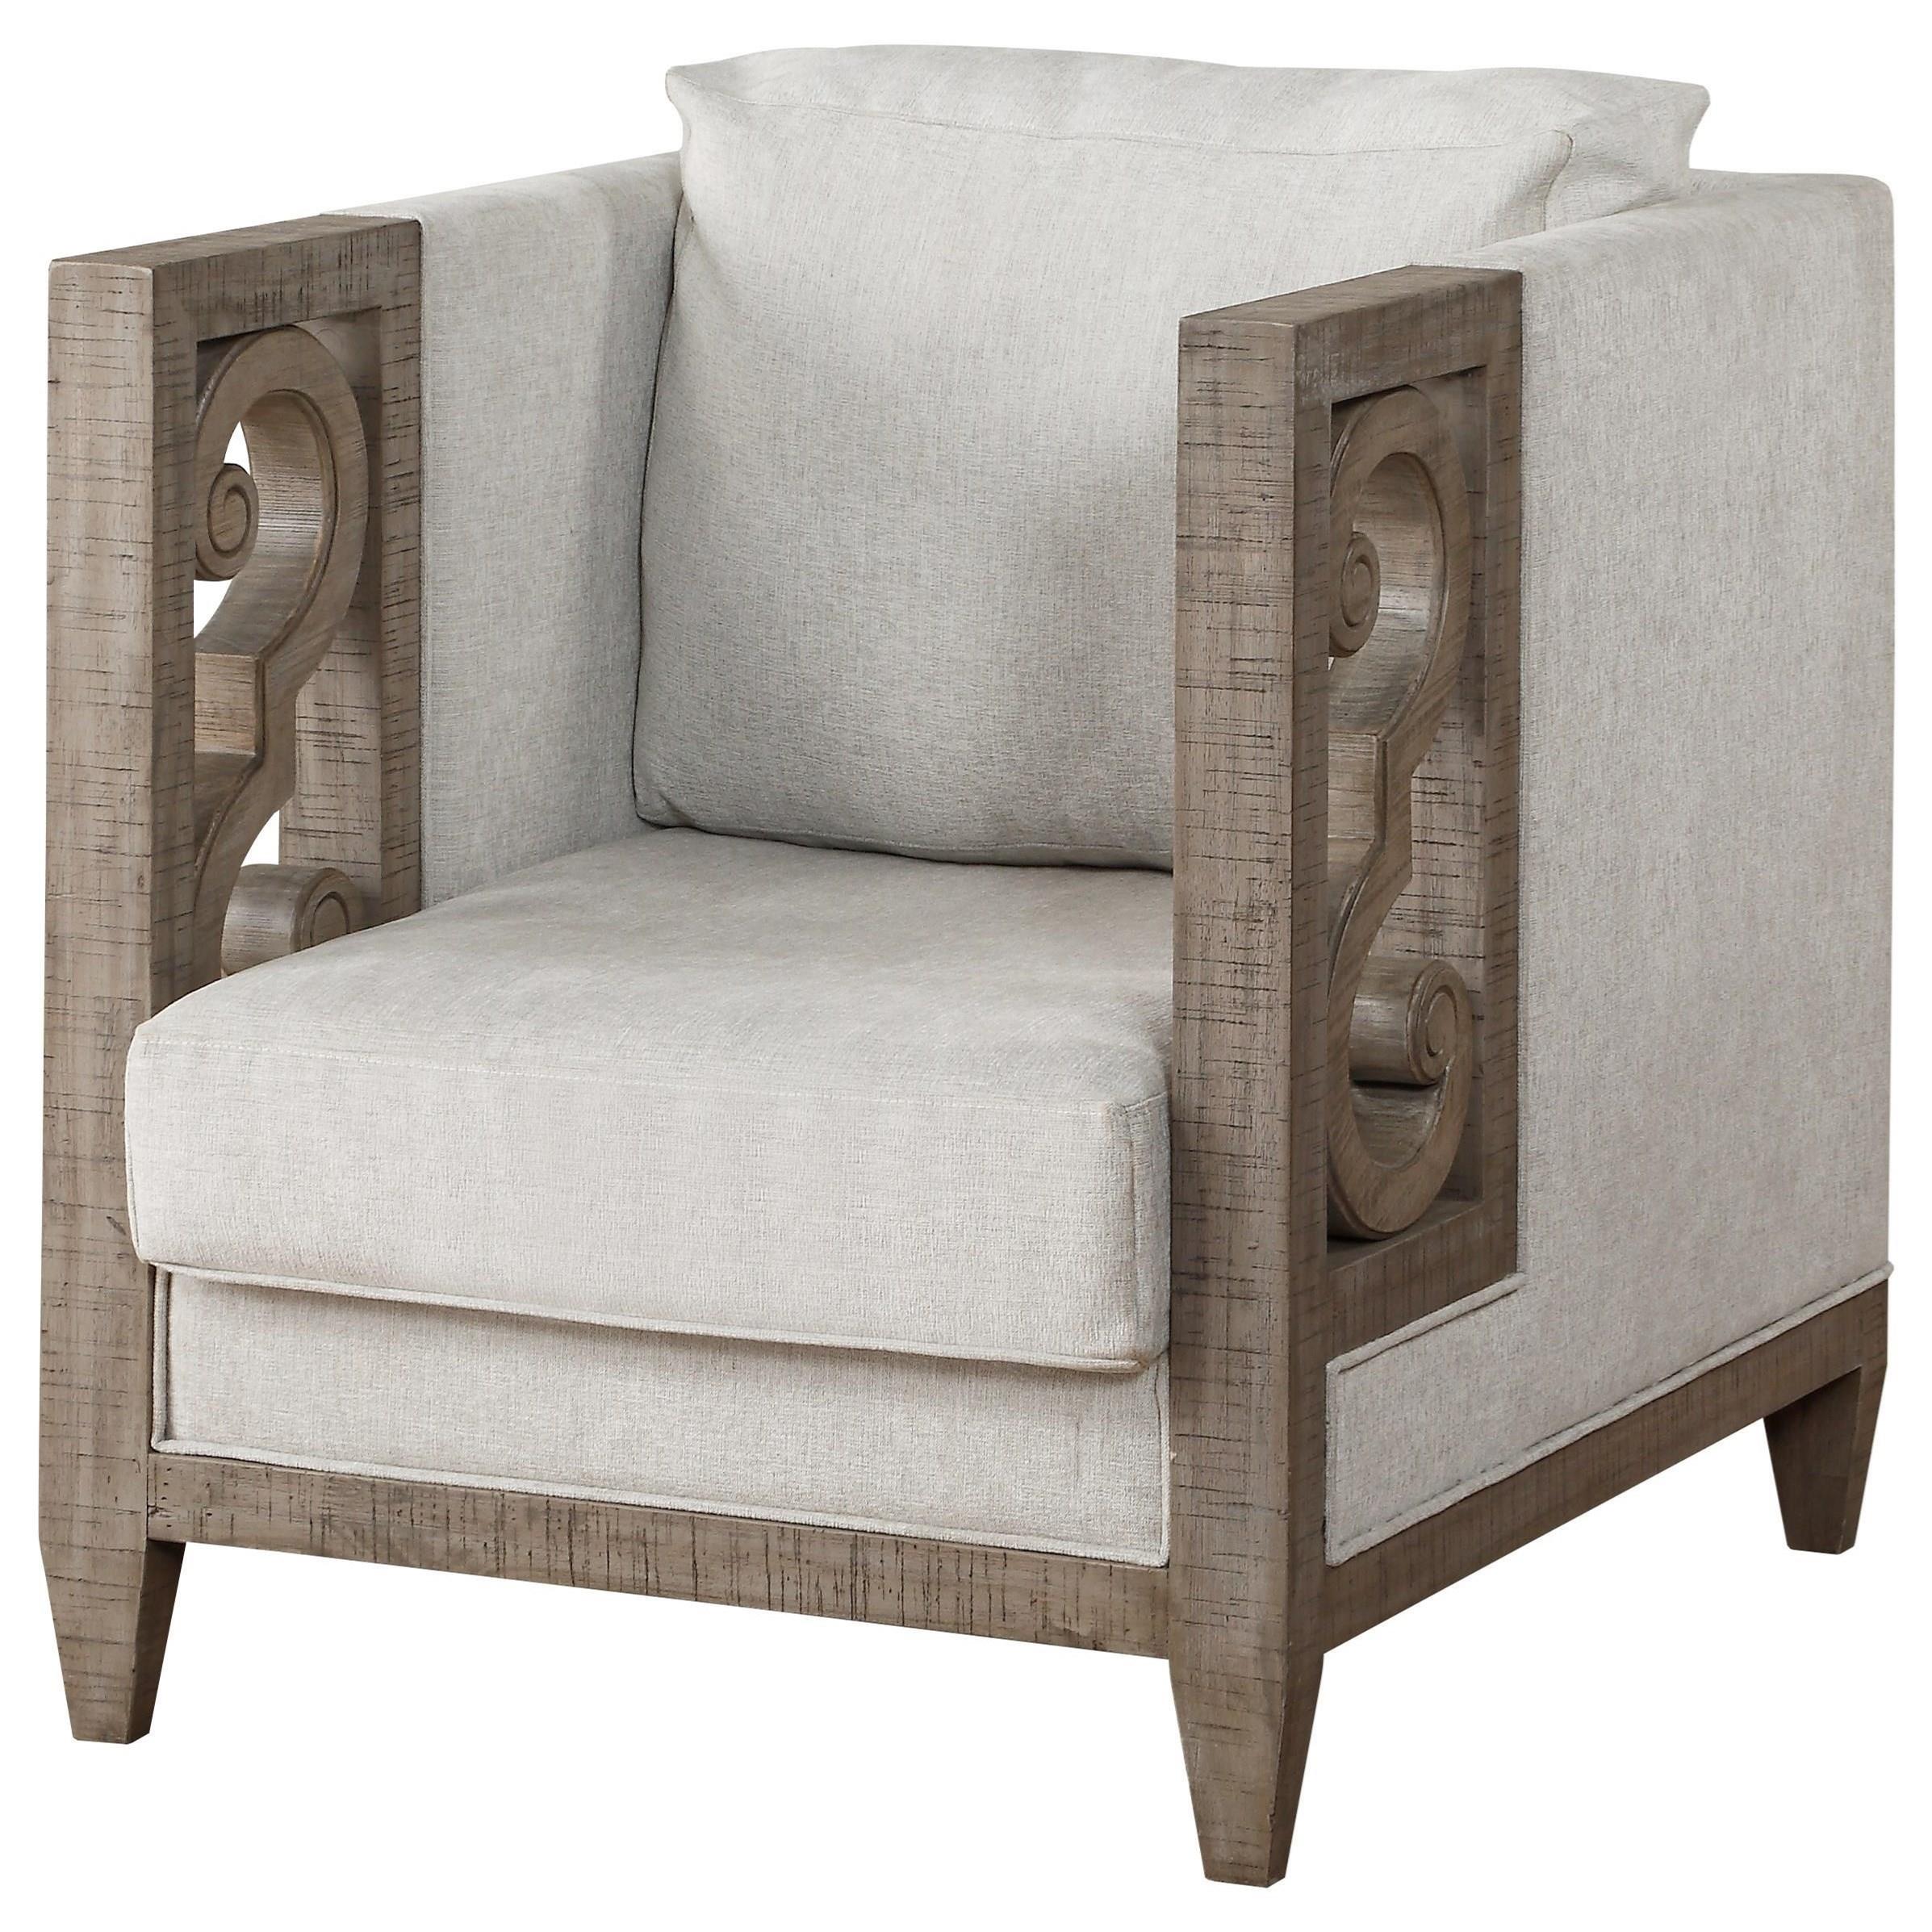 Artesia Chair by Acme Furniture at Carolina Direct